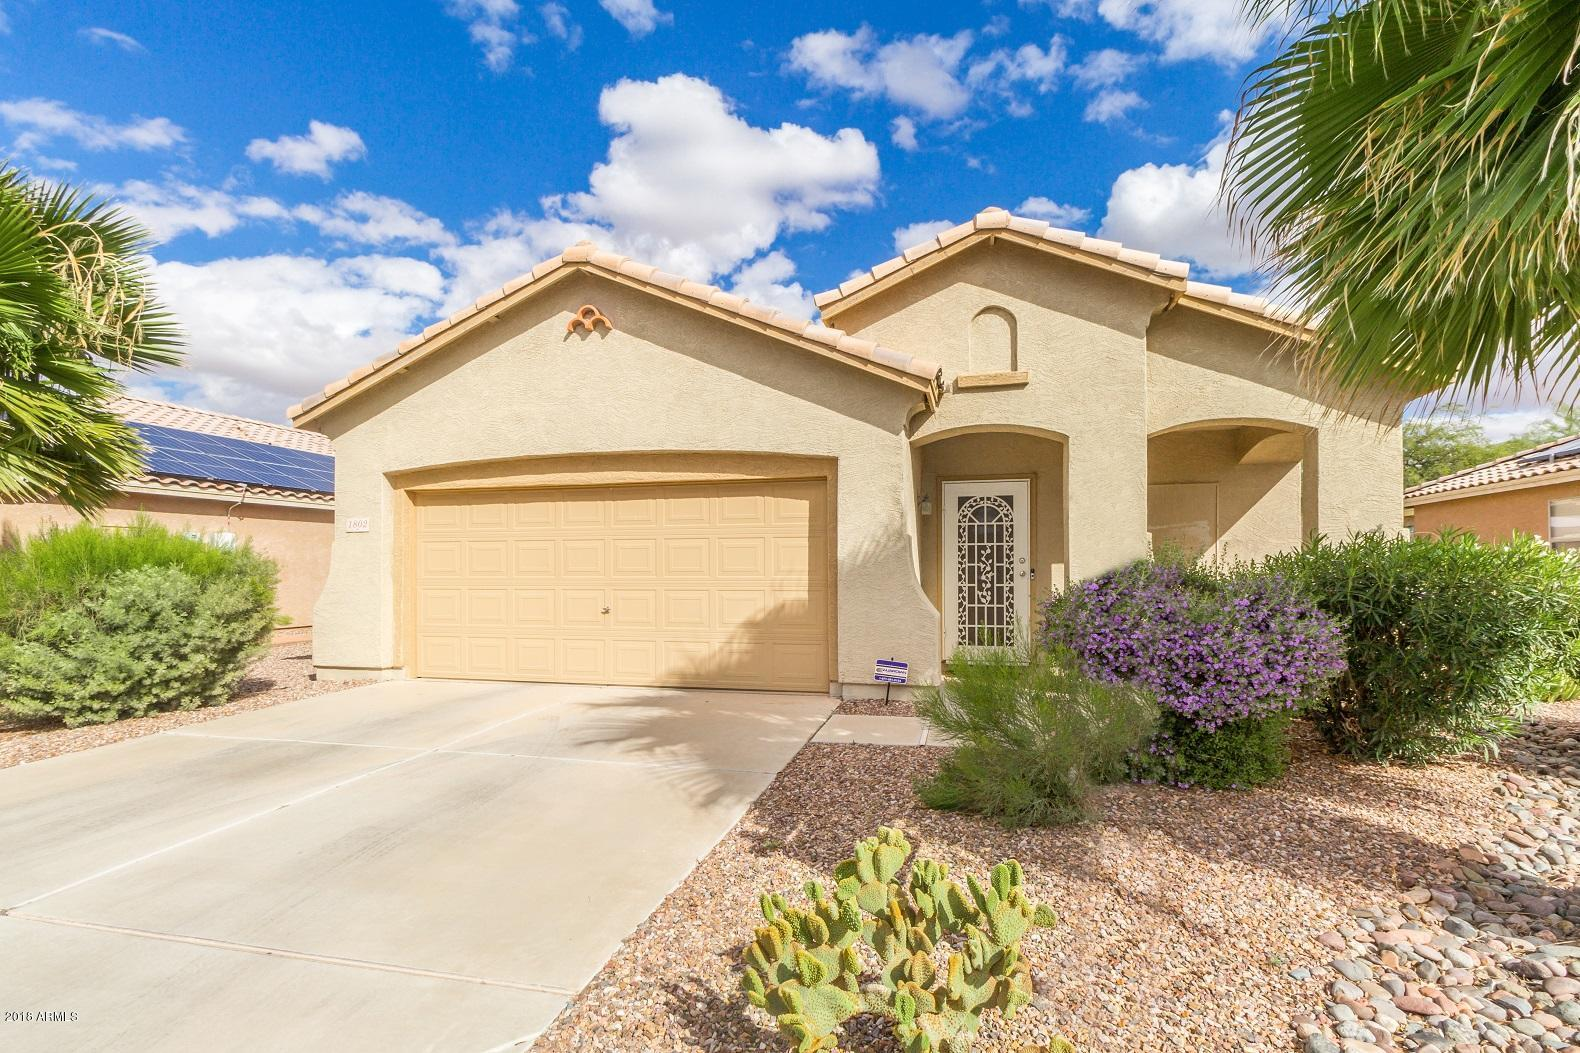 Photo for 1802 N Parkside Lane, Casa Grande, AZ 85122 (MLS # 5835010)